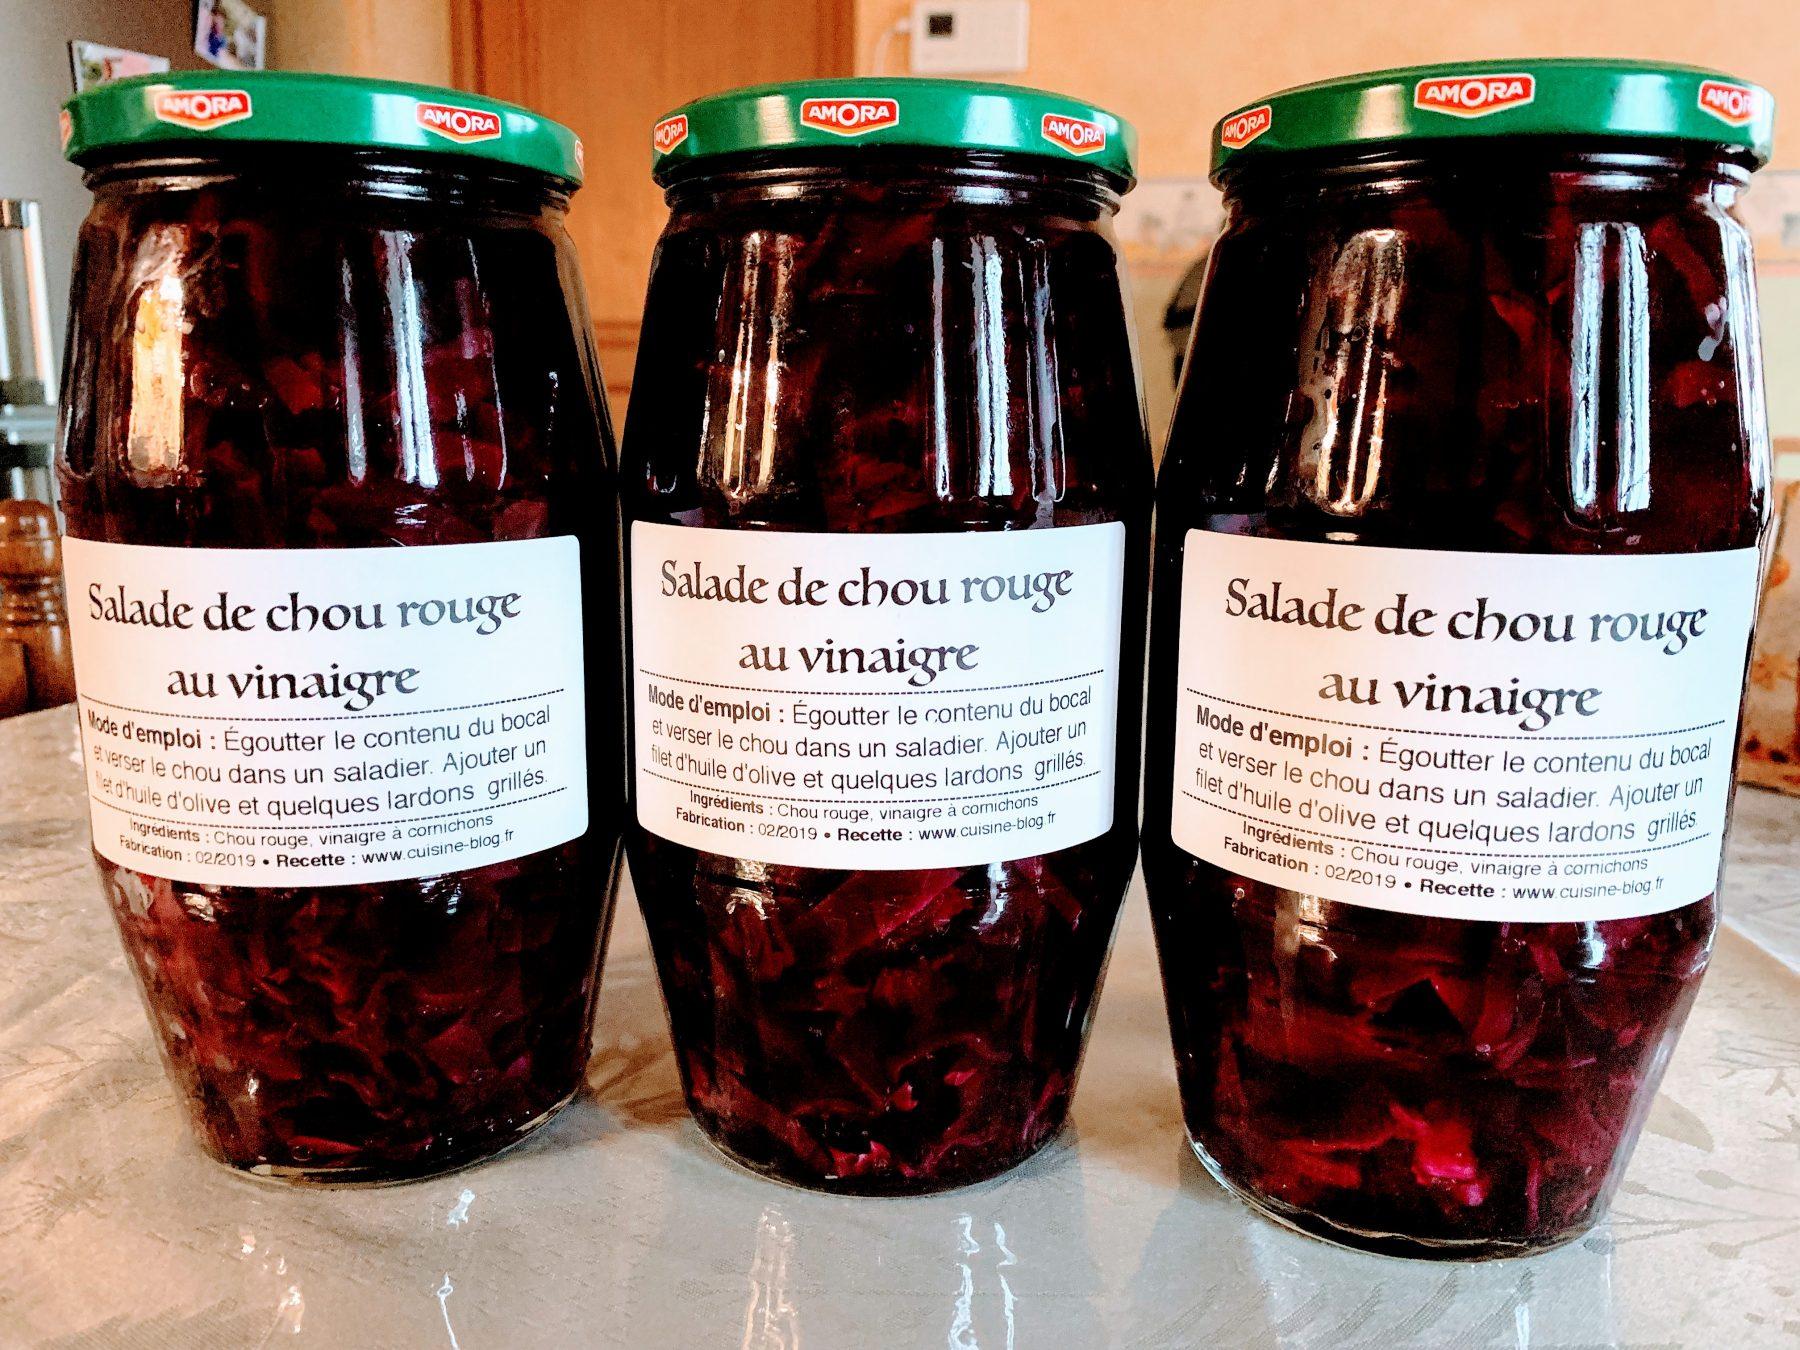 IMG 6009 - Salade de chou rouge au vinaigre